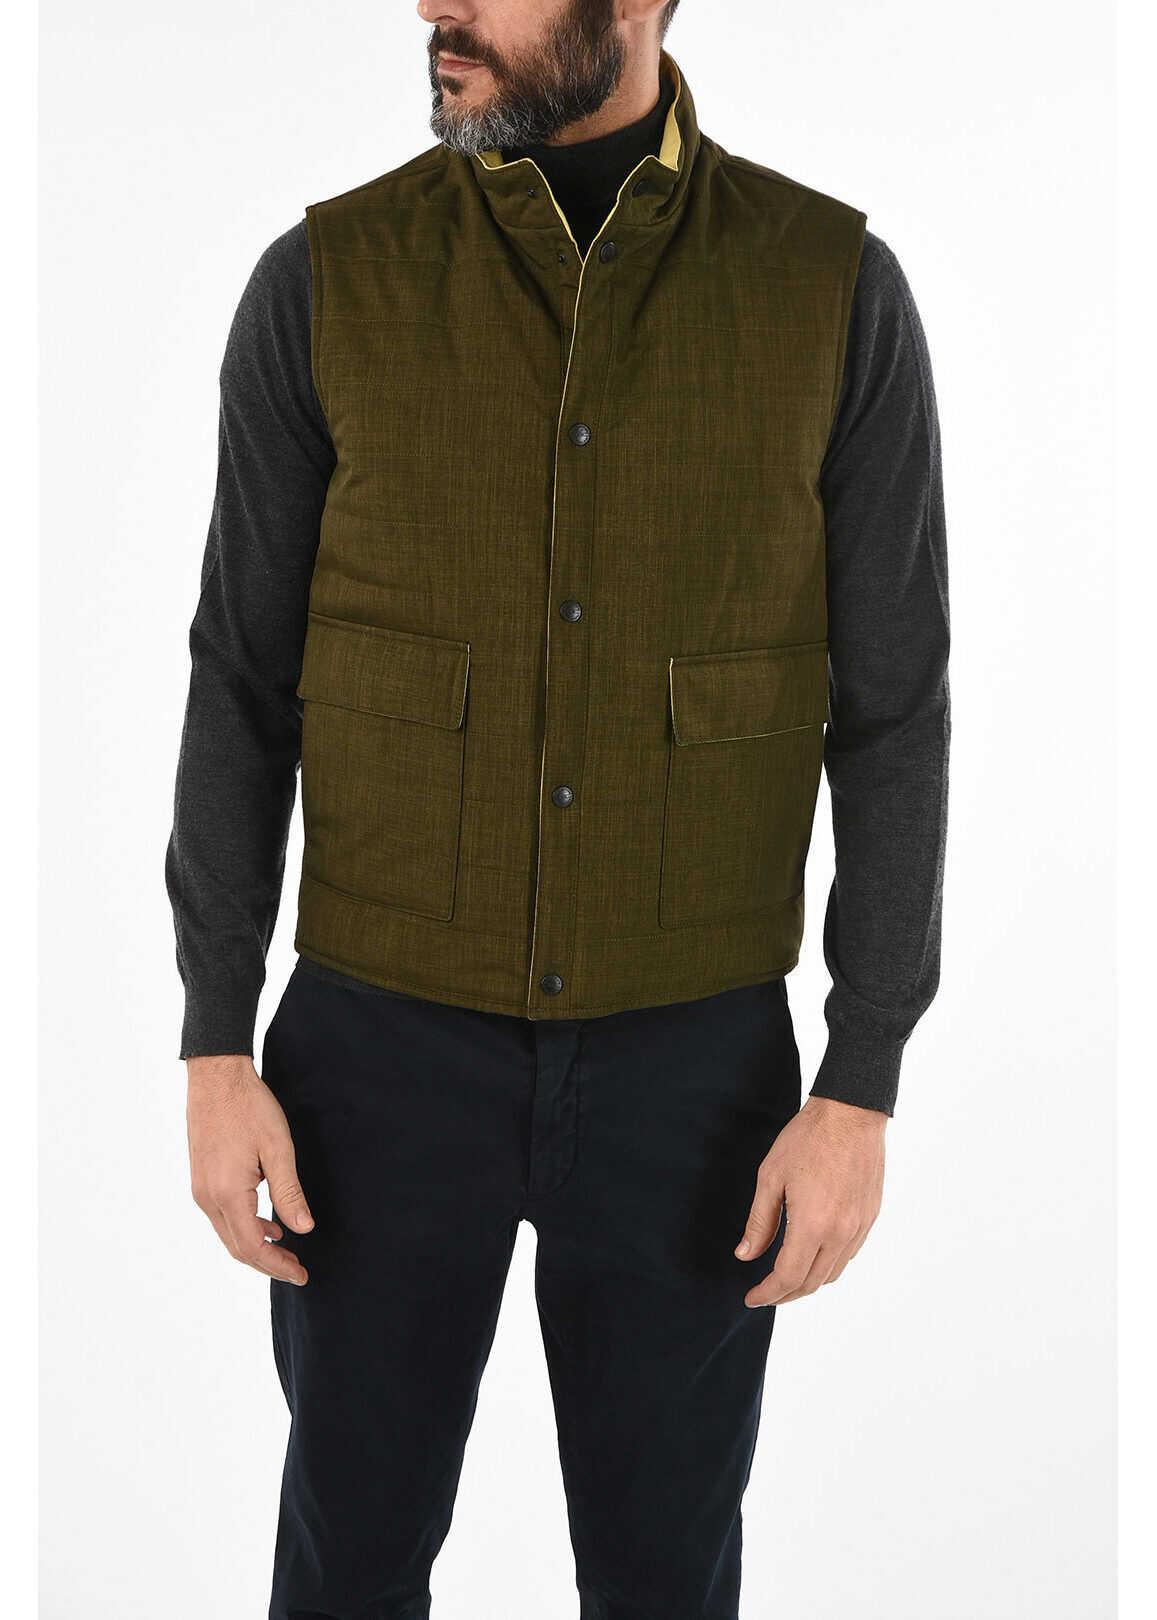 CORNELIANI CC COLLECTION Reversible VITALY Vest BROWN imagine